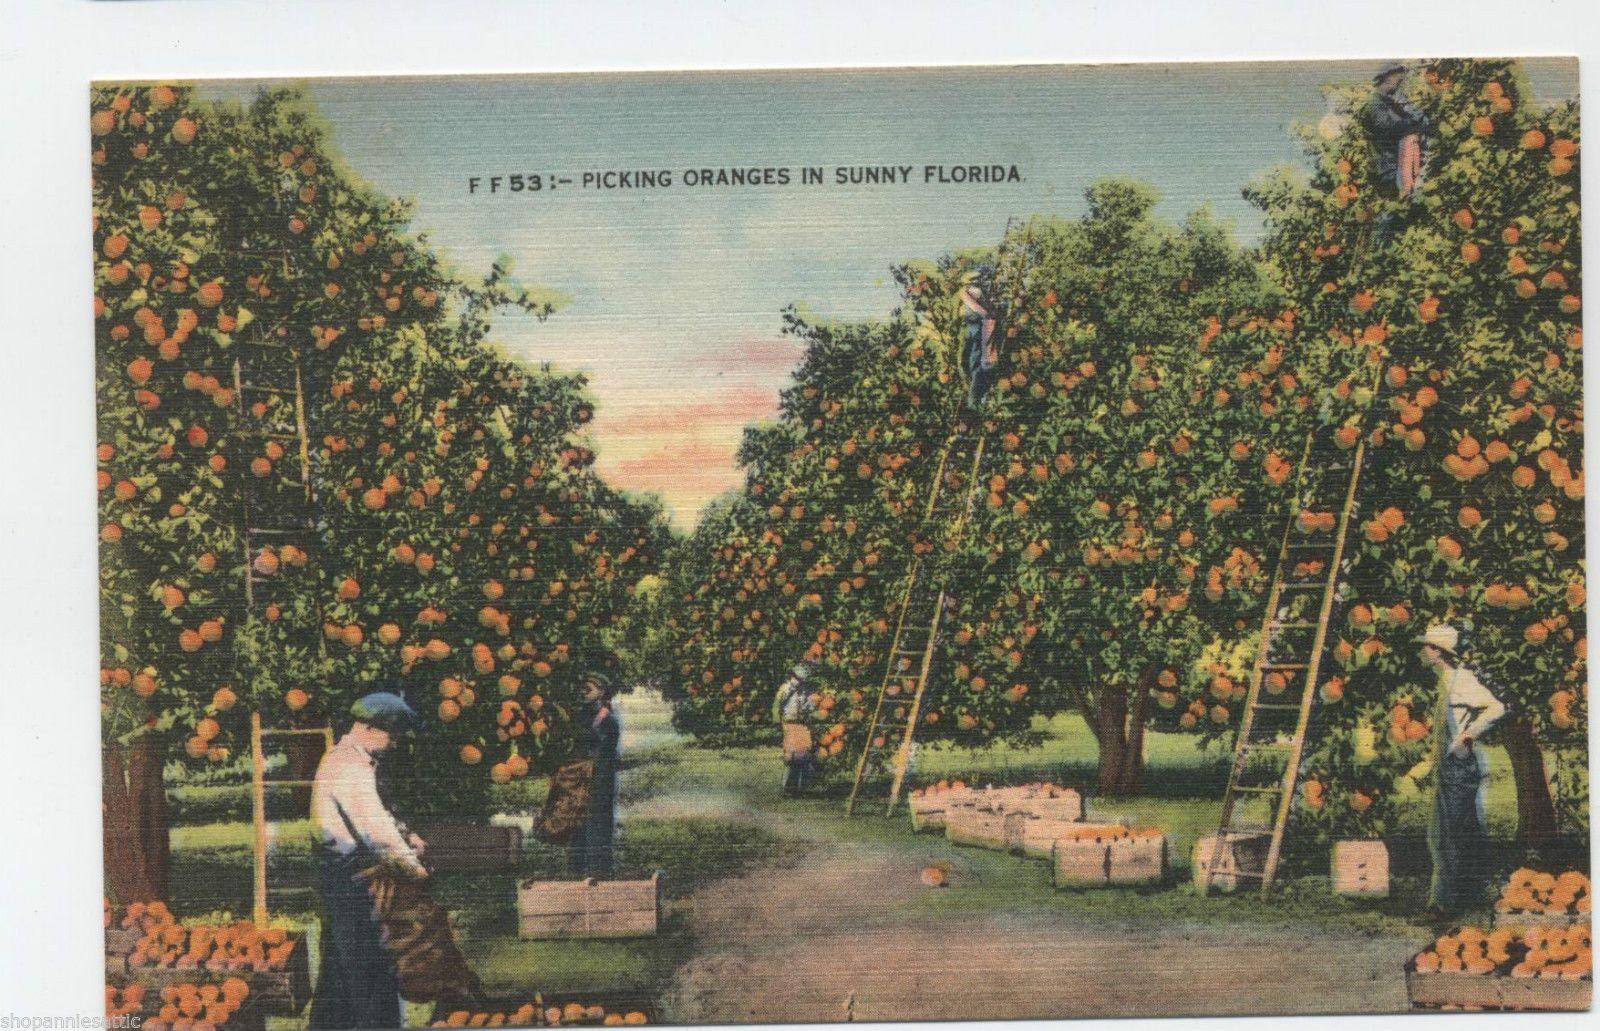 Vtg Pc Postcard Florida Picking Oranges Orange Grove Workers Wood Crates 1940 039 S Ebay Rio Grande Valley Texas Postcard Rio Grande Valley